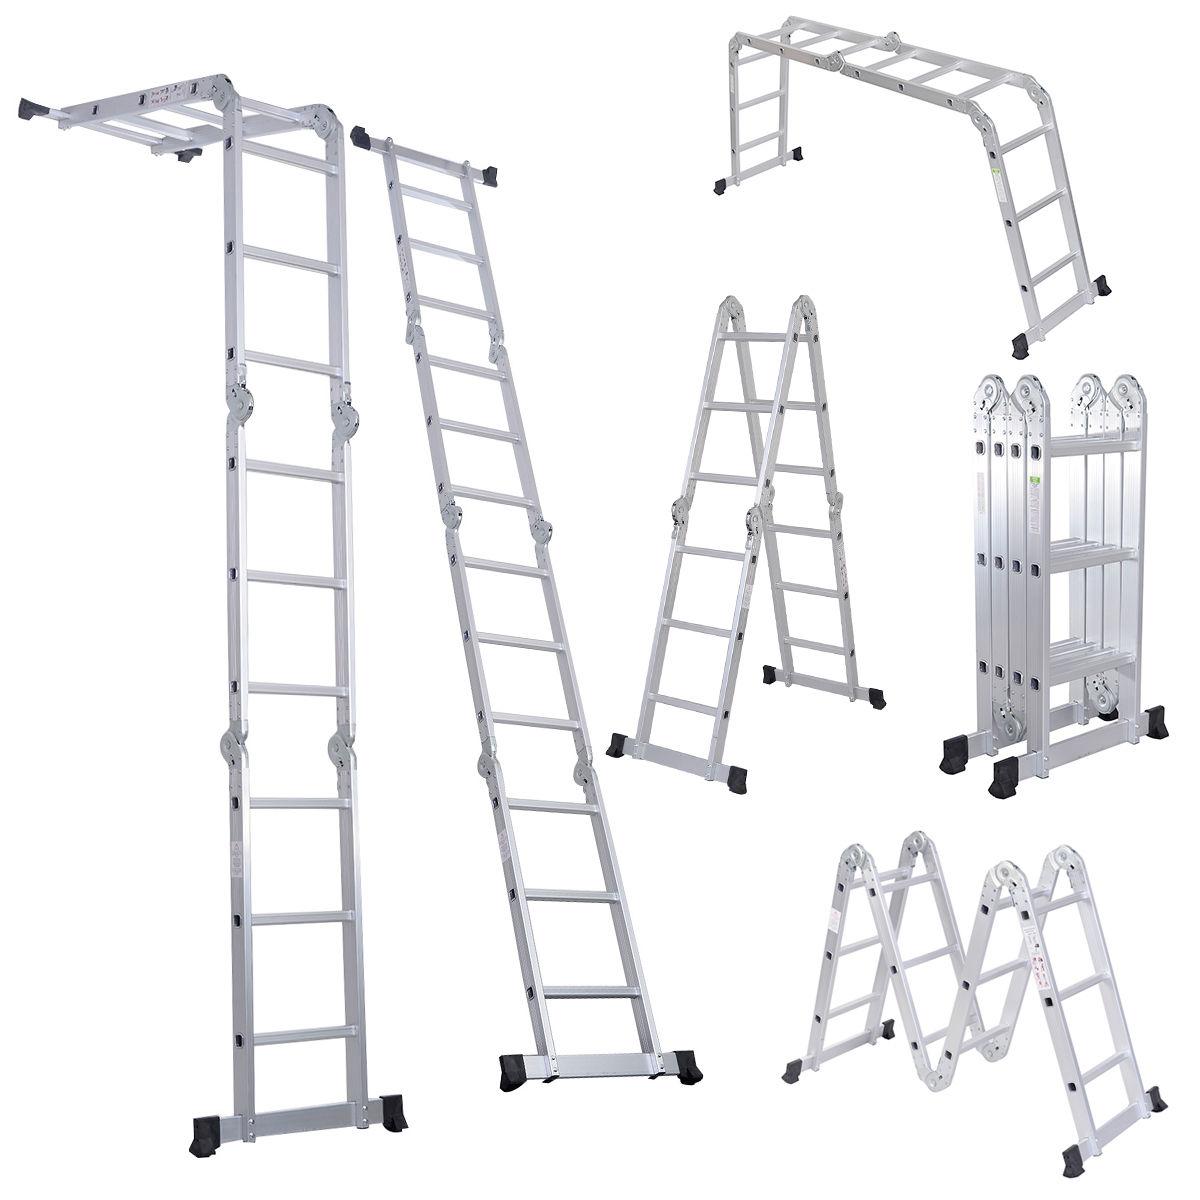 Costway 12.5-ft. Multi Purpose Aluminum Folding Scaffold Ladder